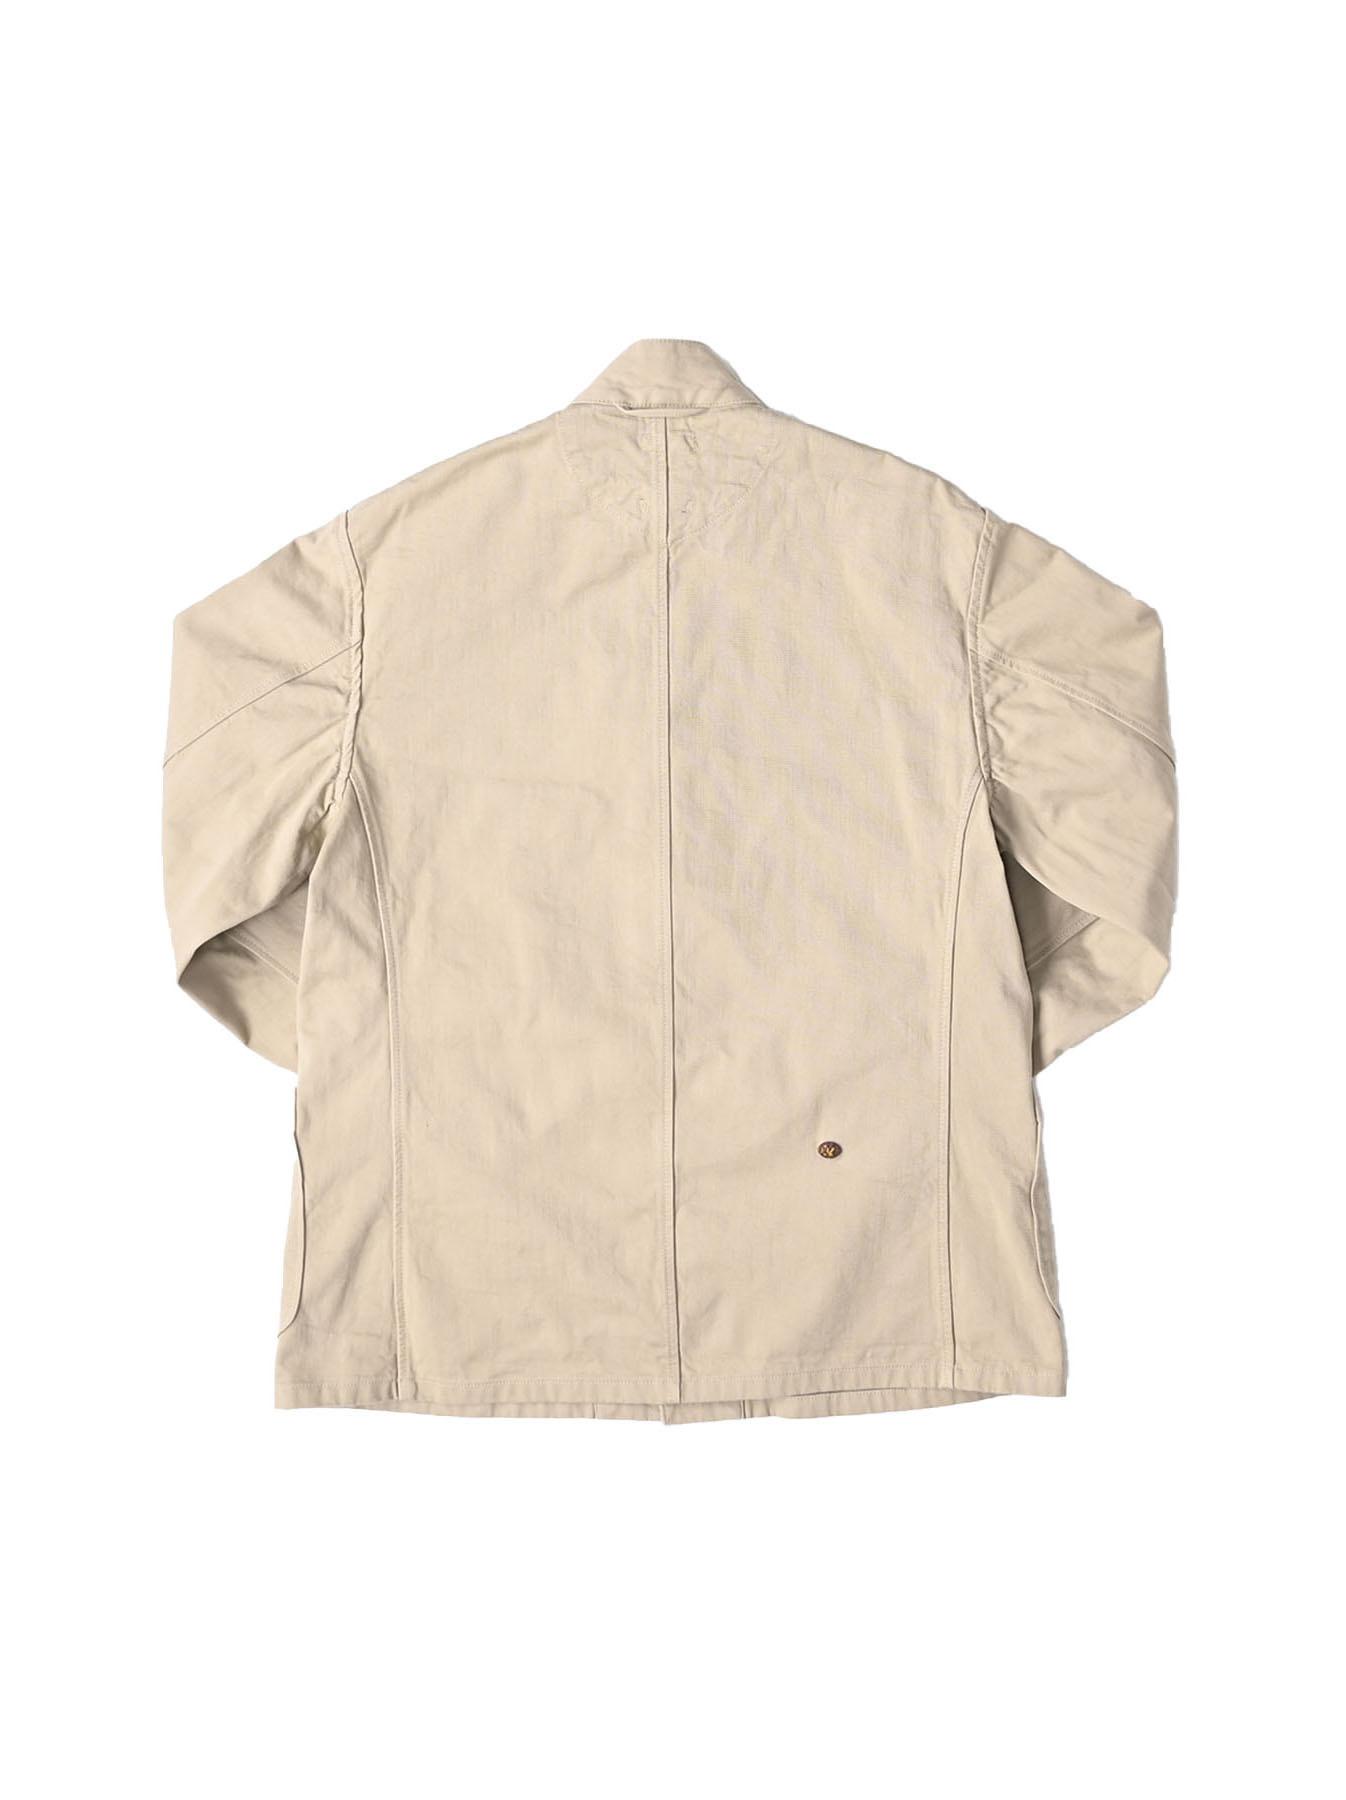 Okome Chino 908 Shirt Jacket-10